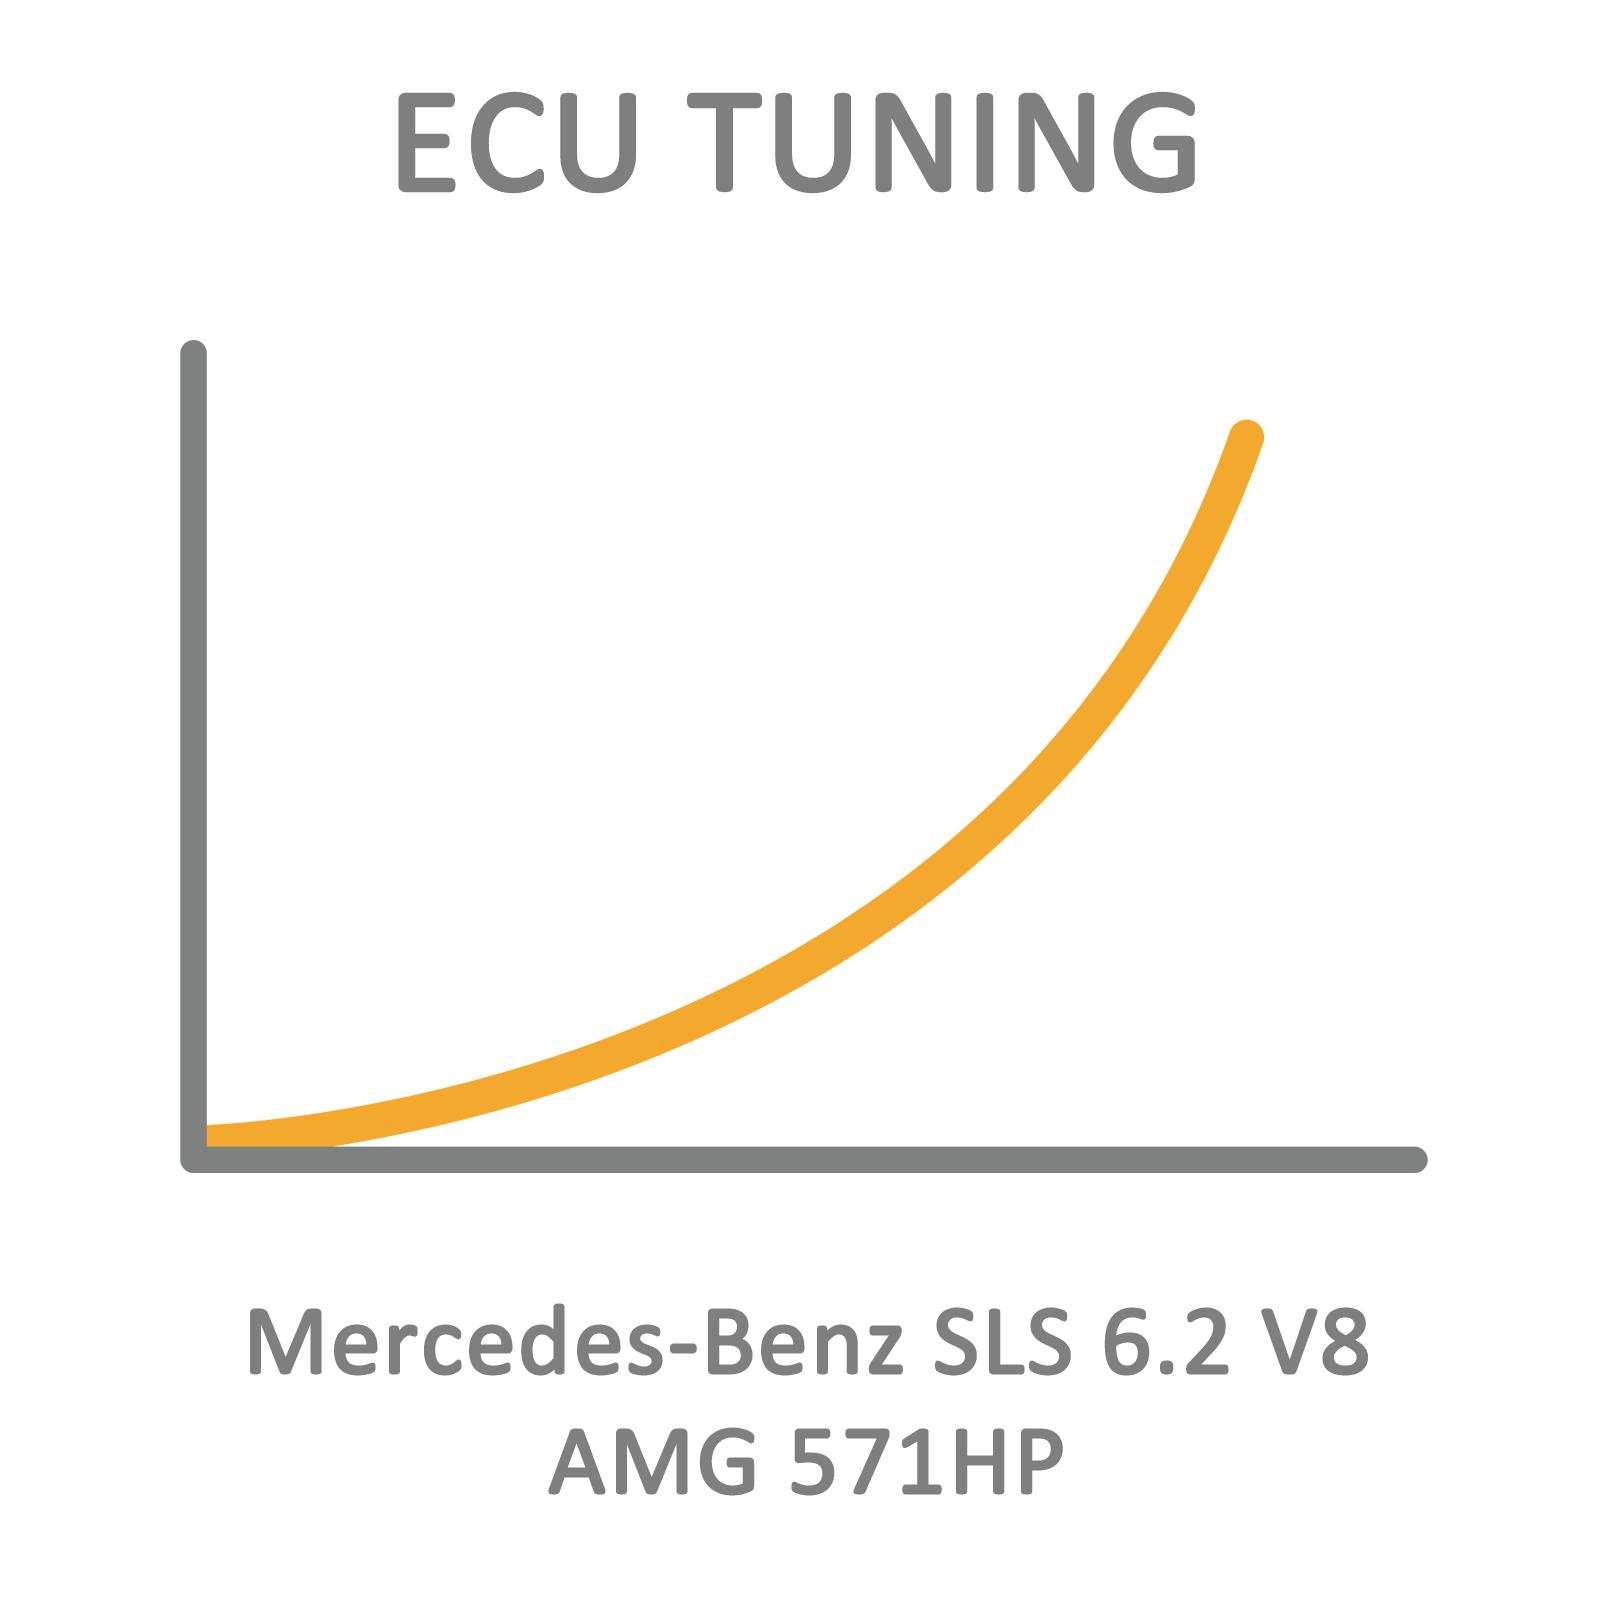 Mercedes-Benz SLS 6.2 V8 AMG 571HP ECU Tuning Remapping